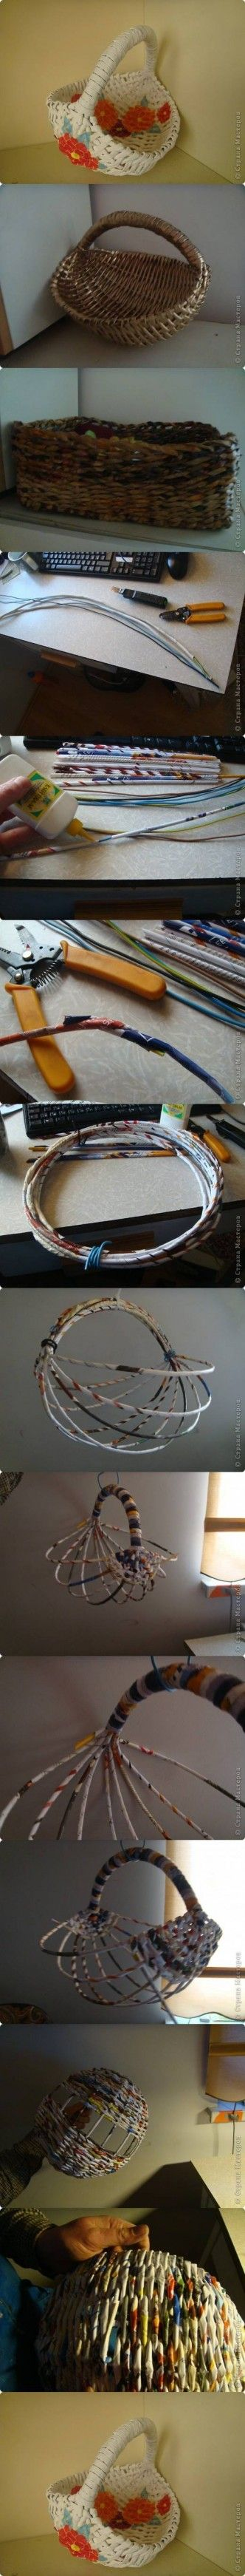 DIY Handmade Basket DIY Projects